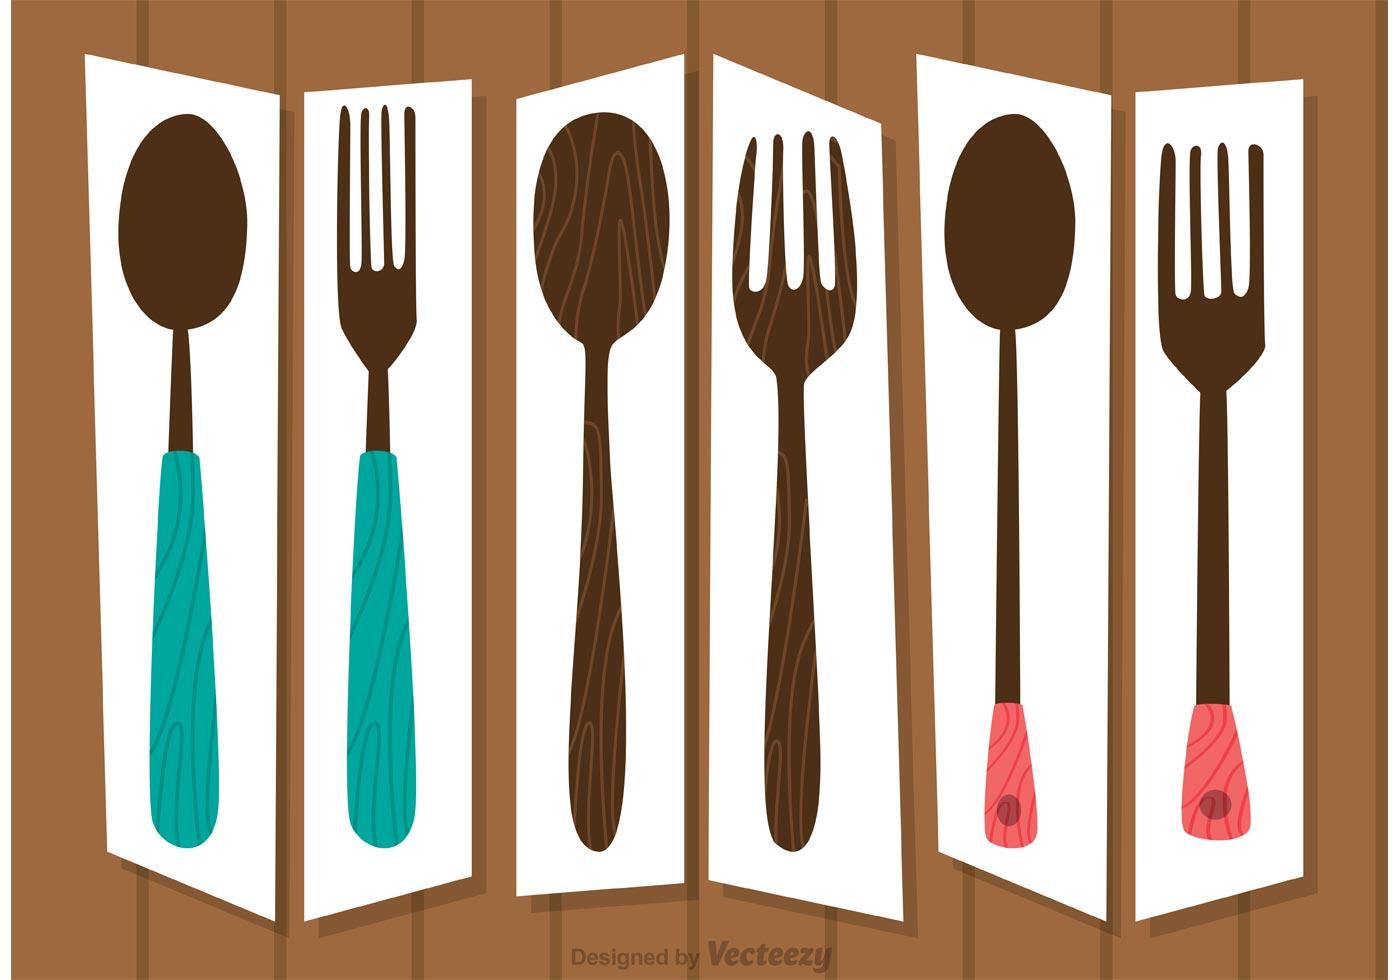 Retro Cutlery Sets Vectors Pack Download Free Vector Art